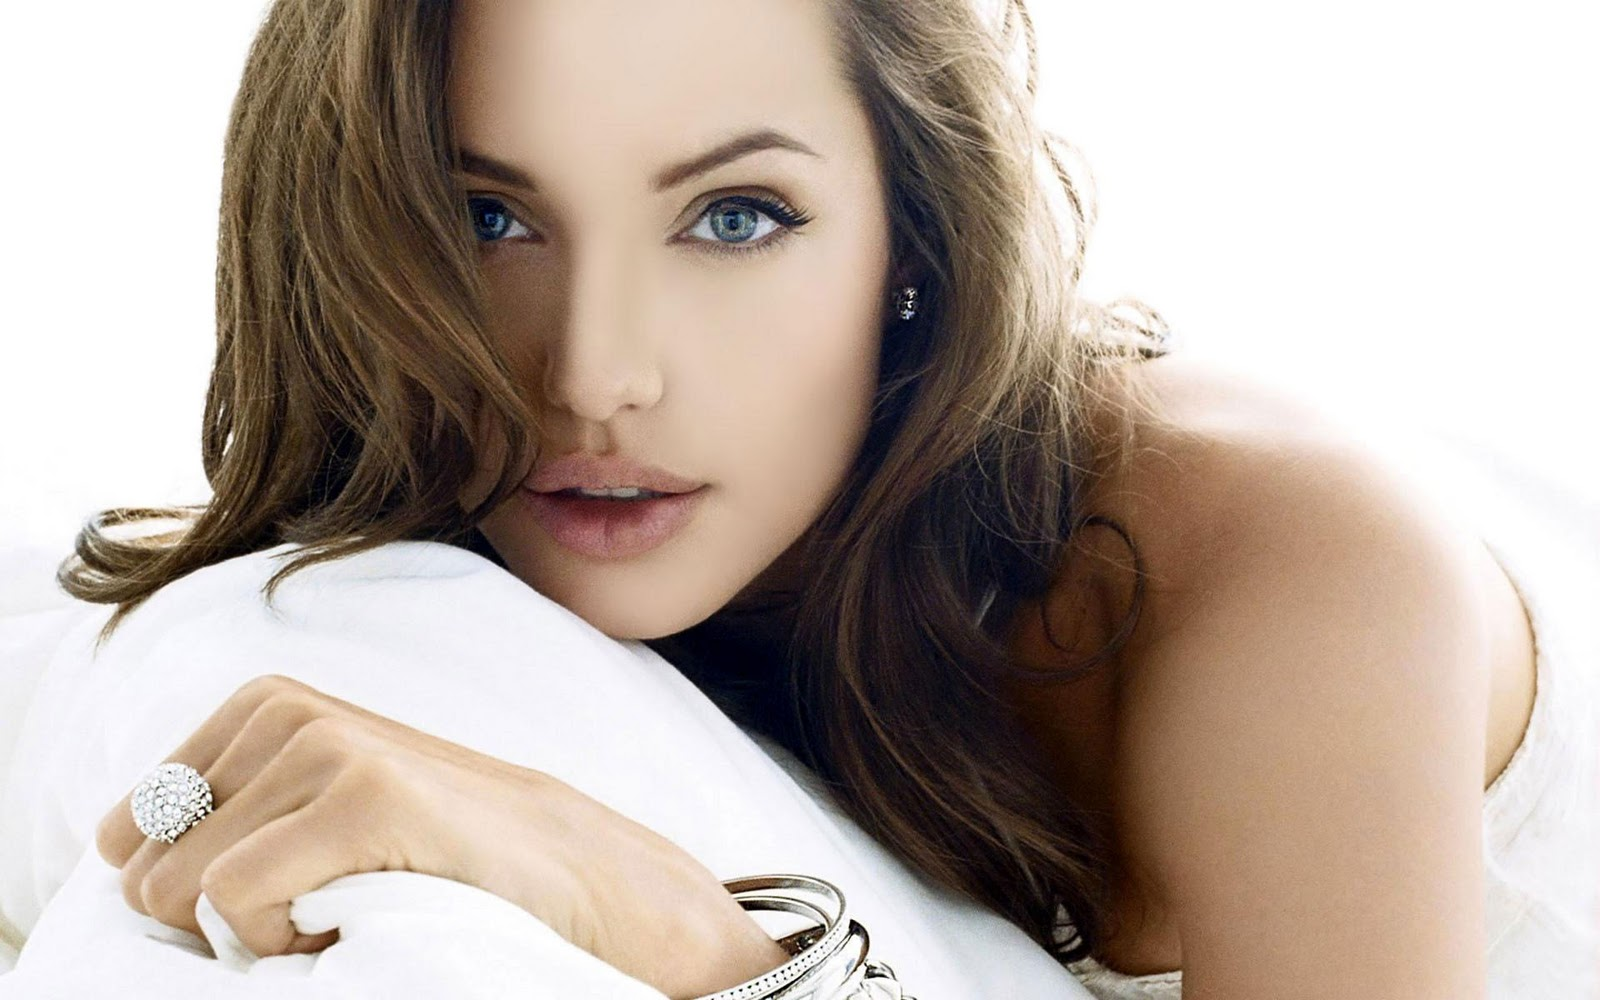 Angelina Jolie Hd Wallpapers: HD Wallpepars: Angelina Jolie HD Wallpapers(4